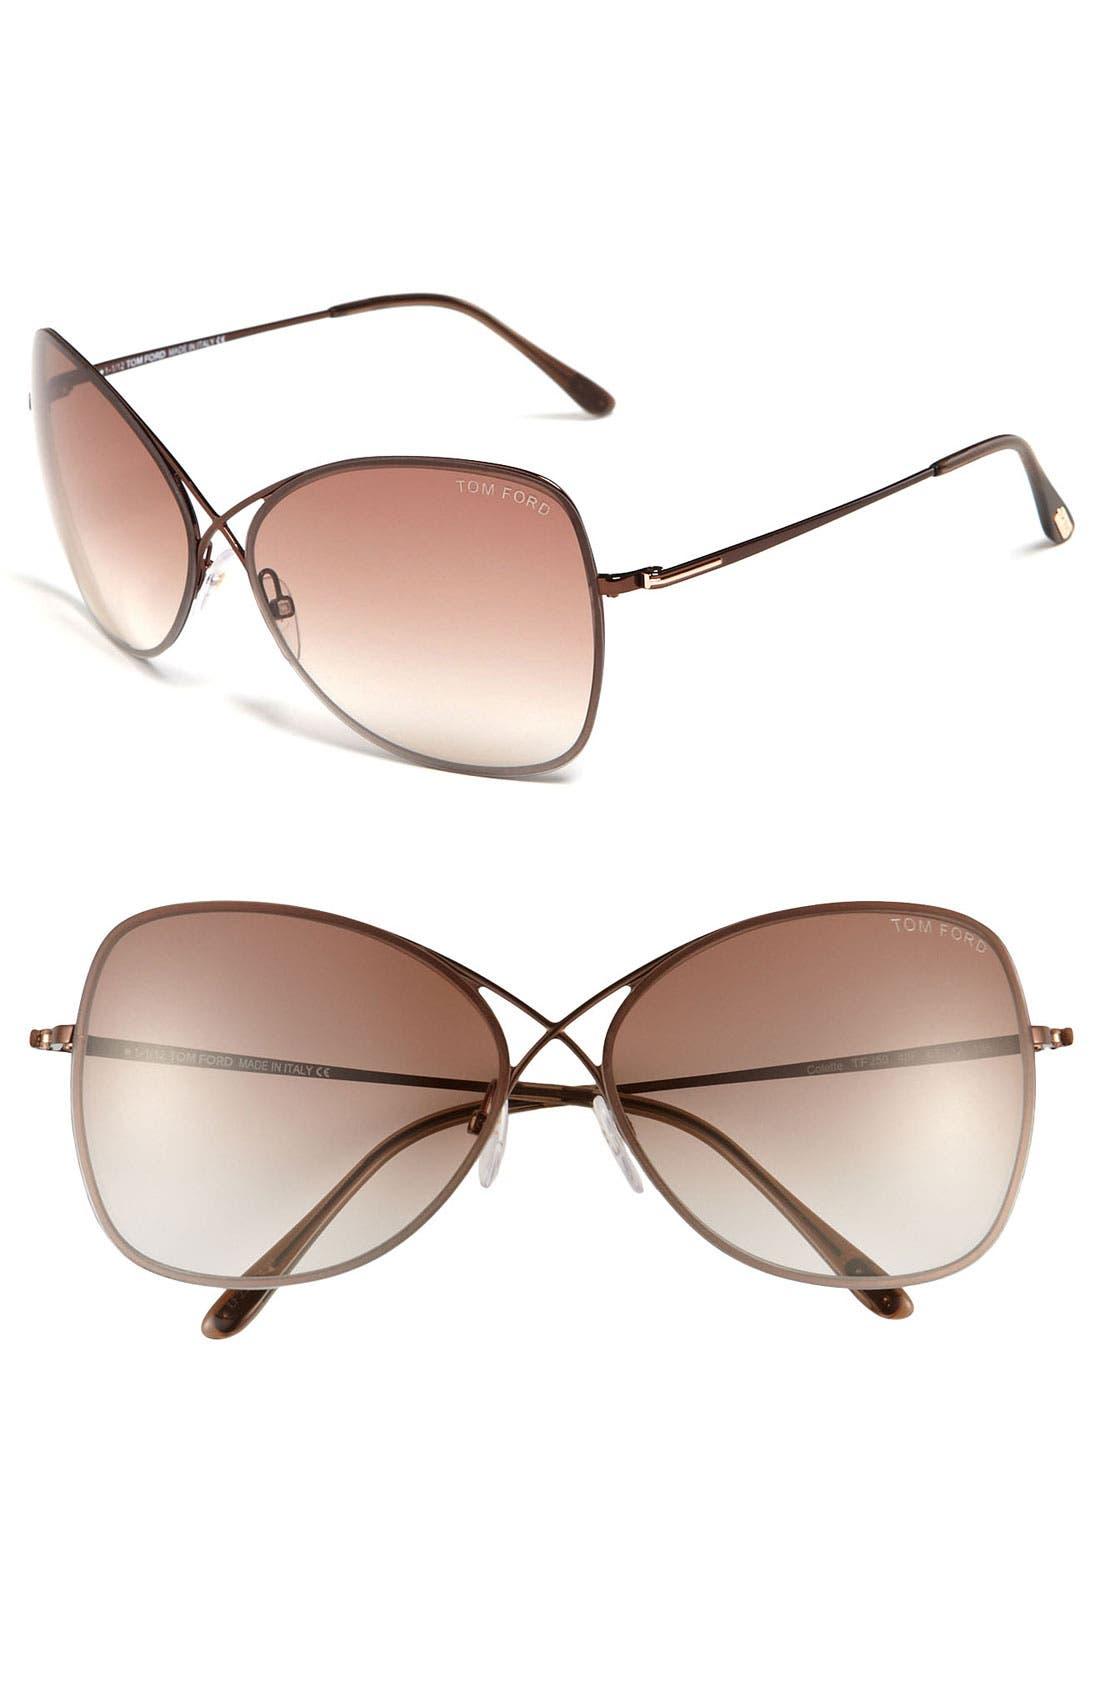 'Colette' 63mm Oversized Sunglasses,                             Main thumbnail 1, color,                             200